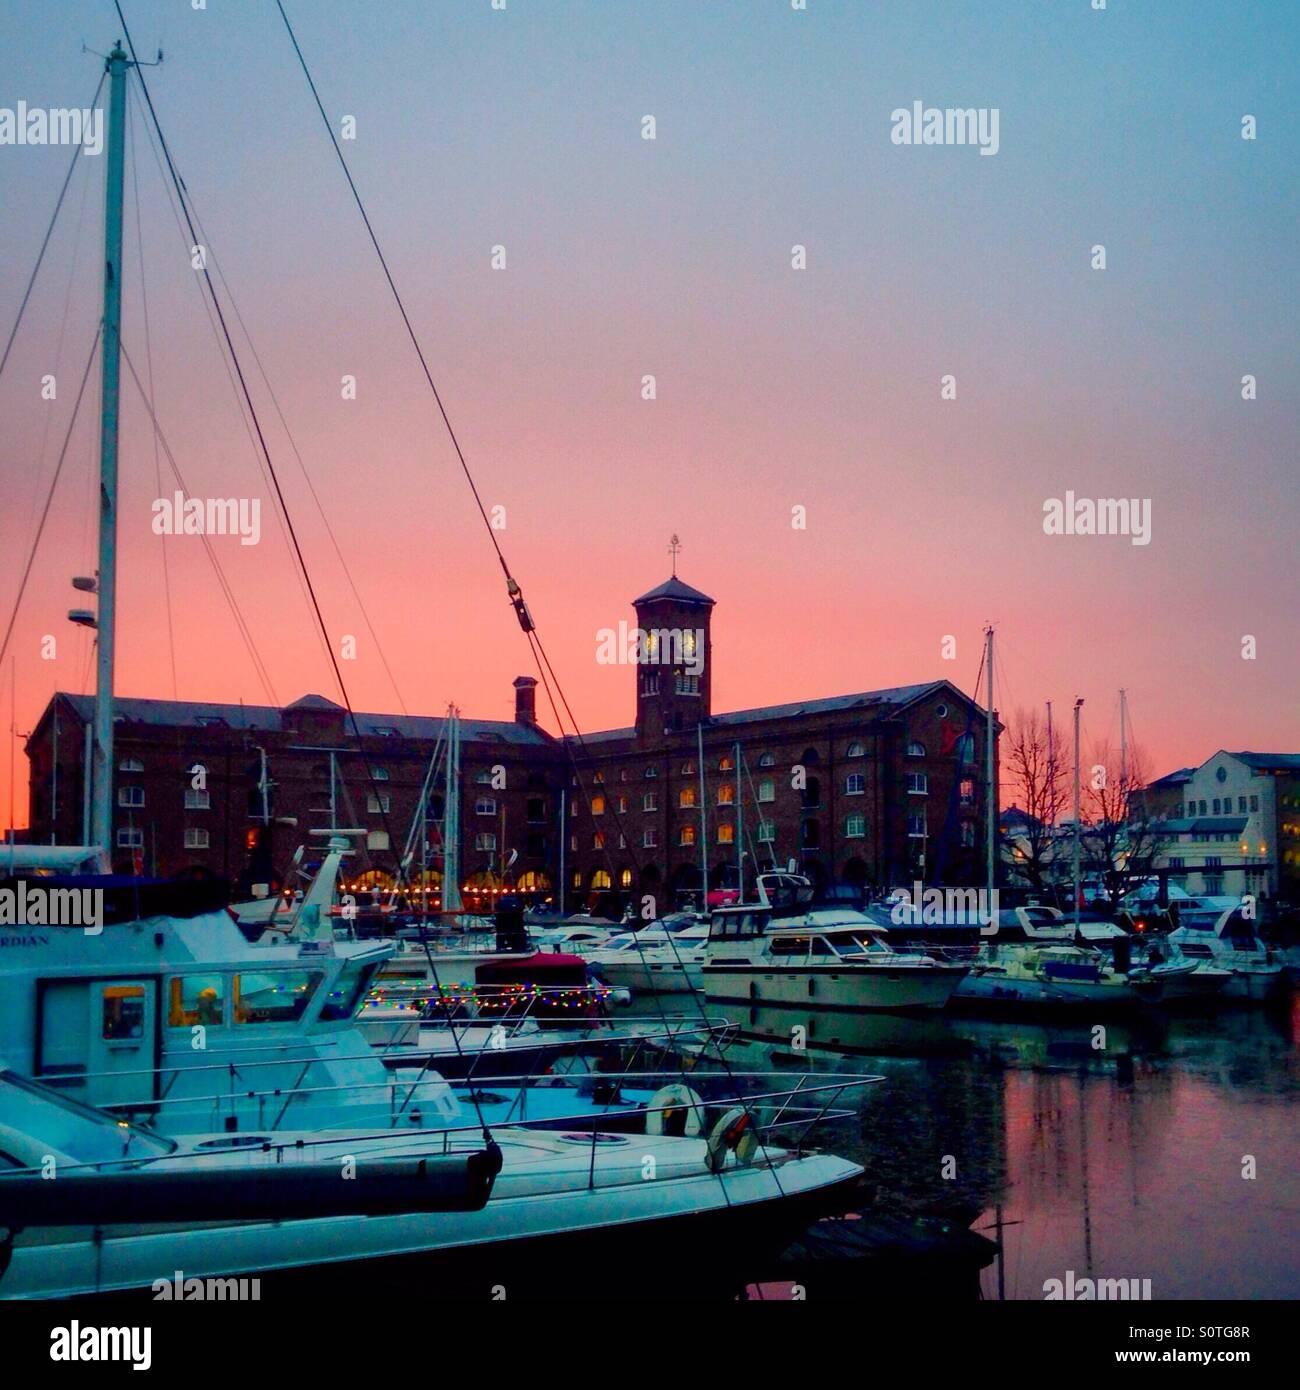 Pink sunrise over St Katharine's Docks - Stock Image